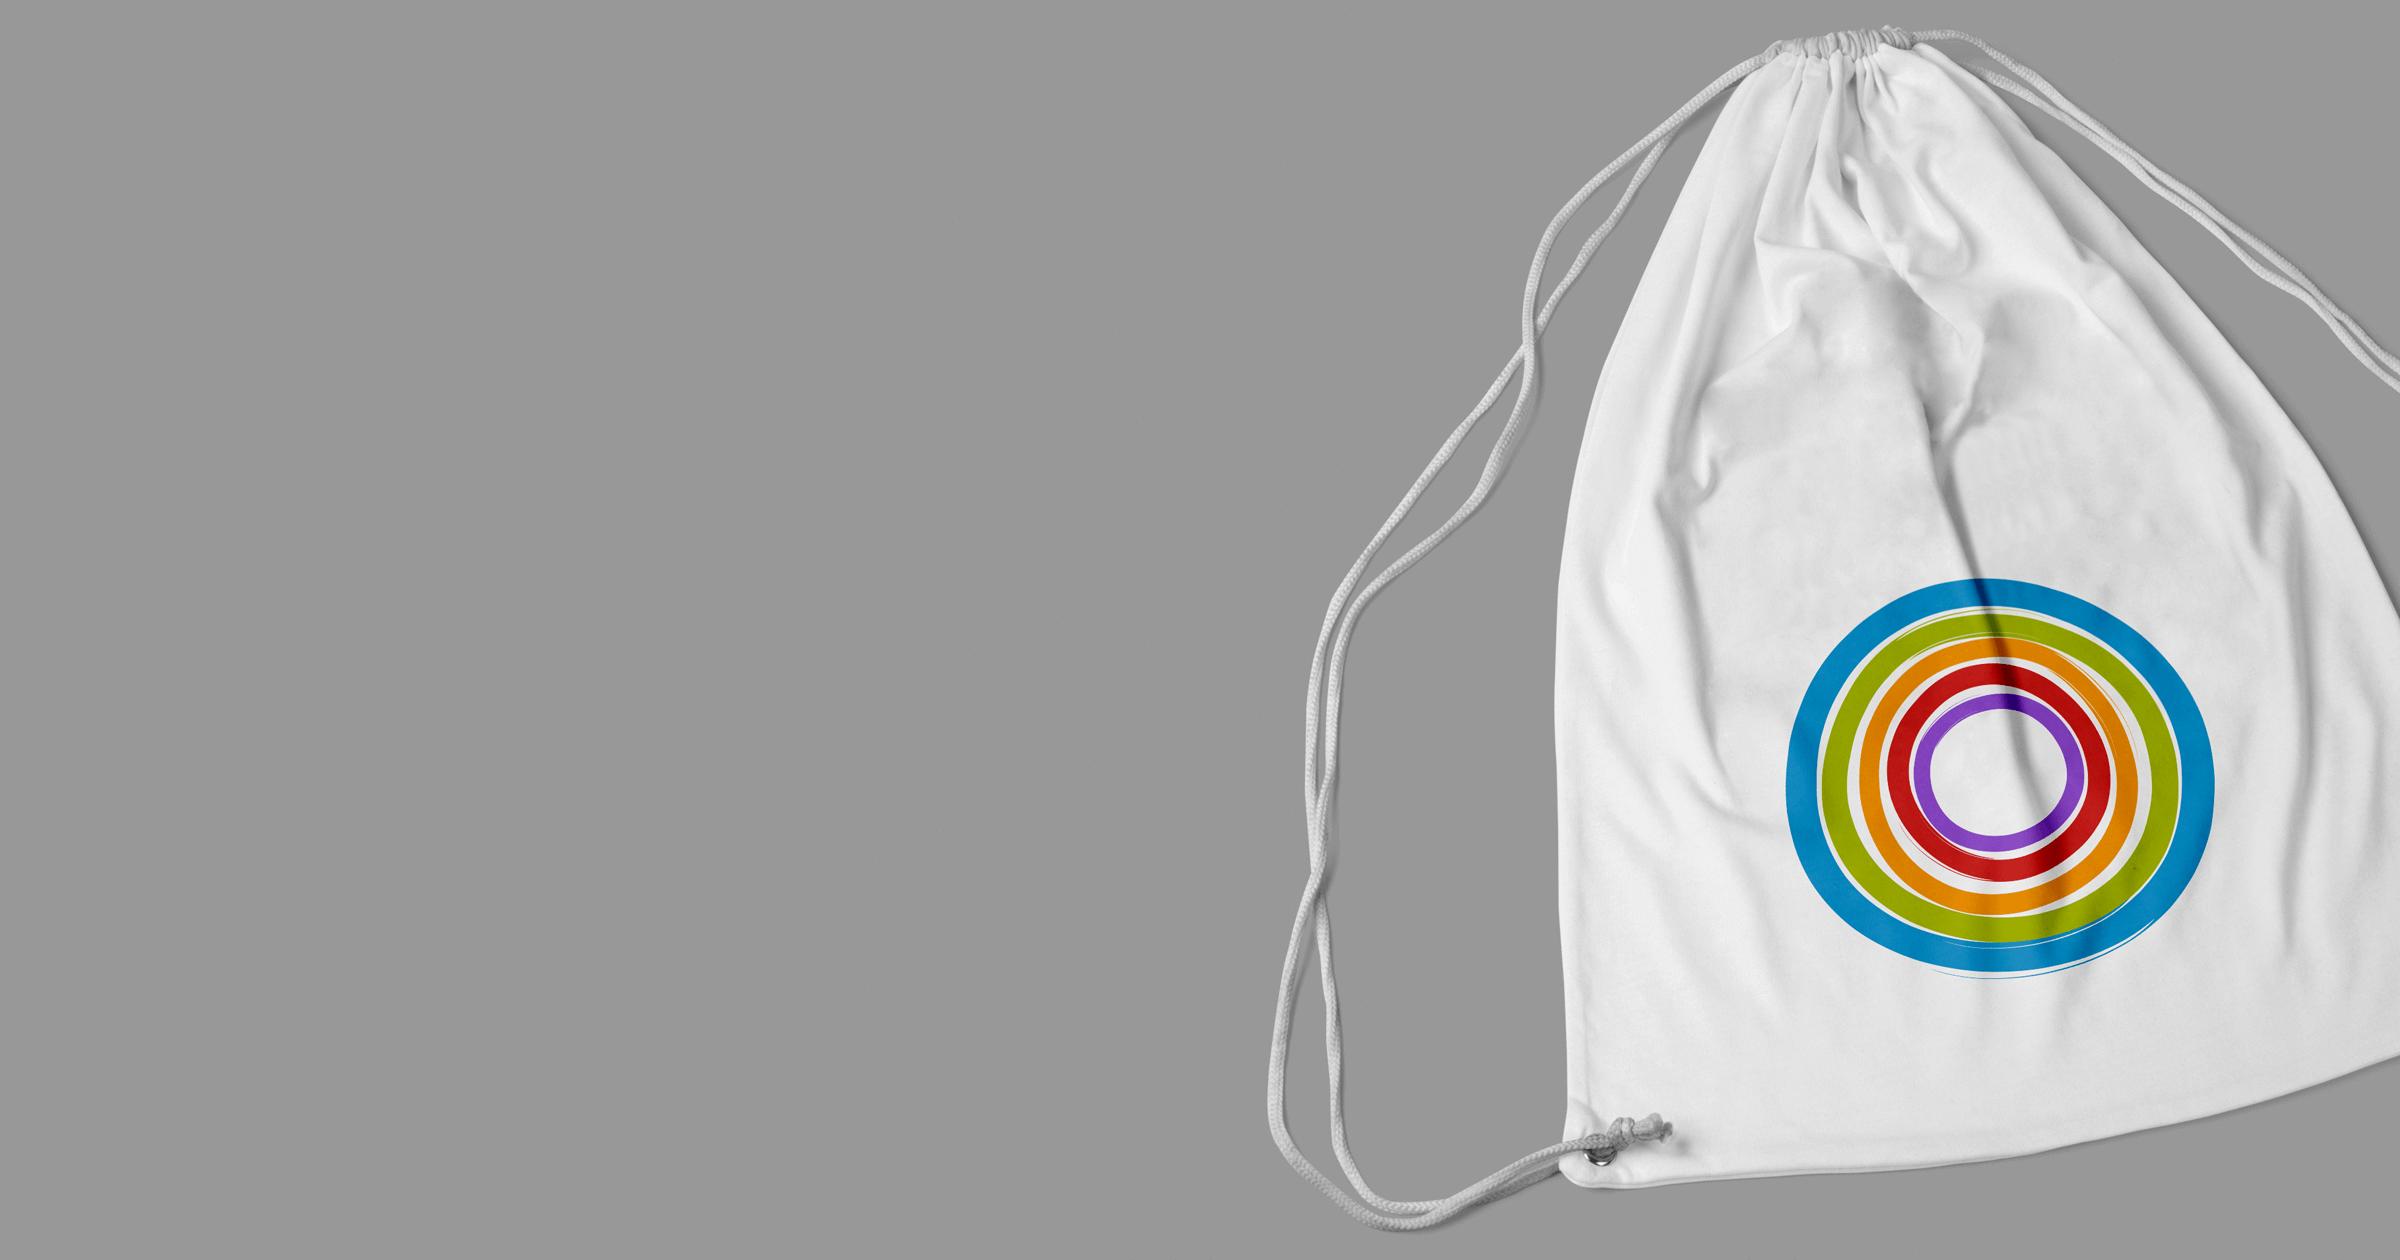 The First School drawstring bag